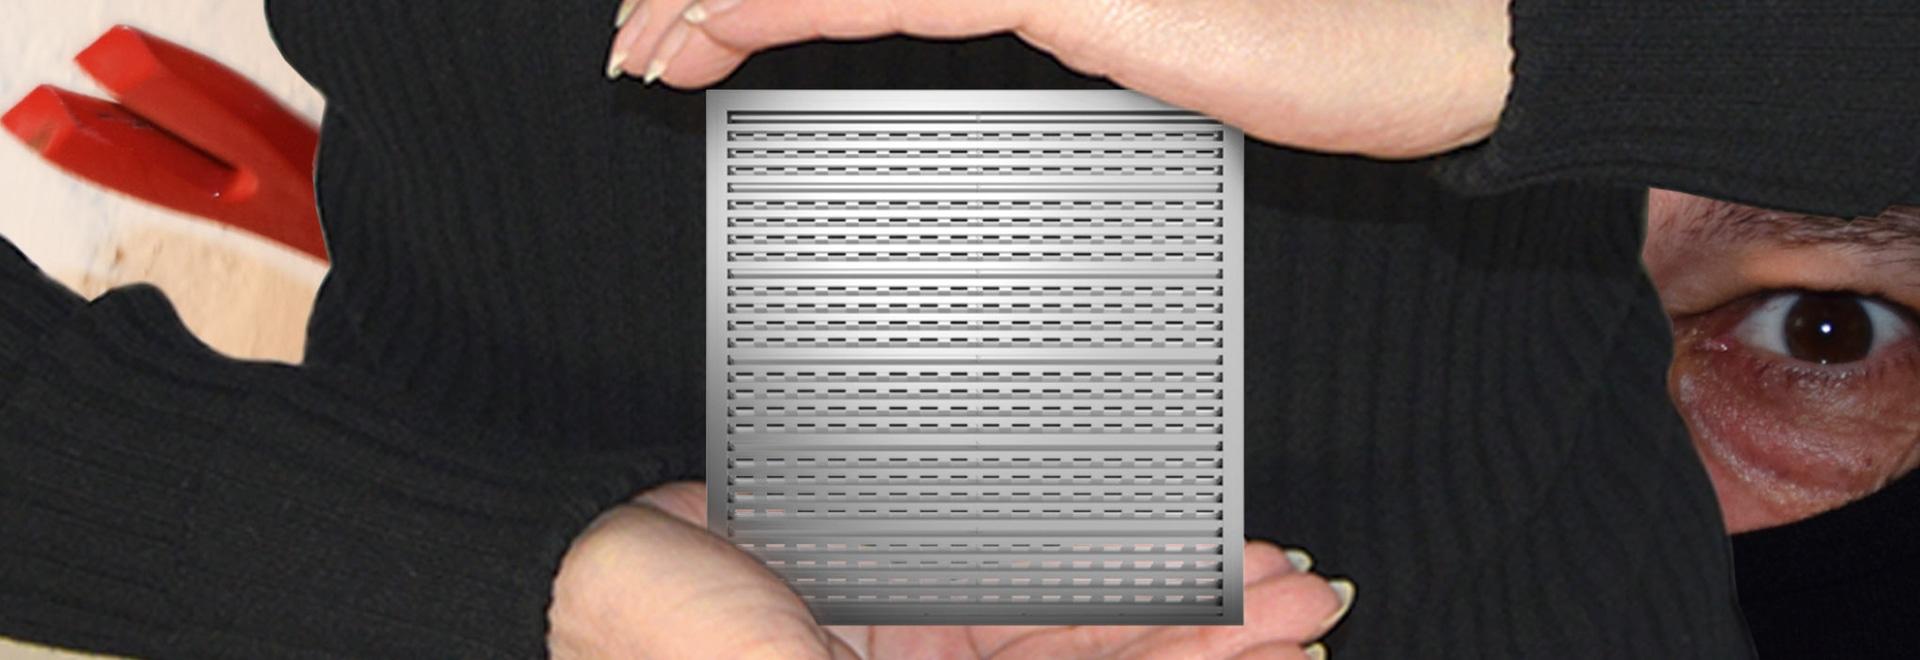 Burglar-Resistant Ventilation Grille Type 512RC2